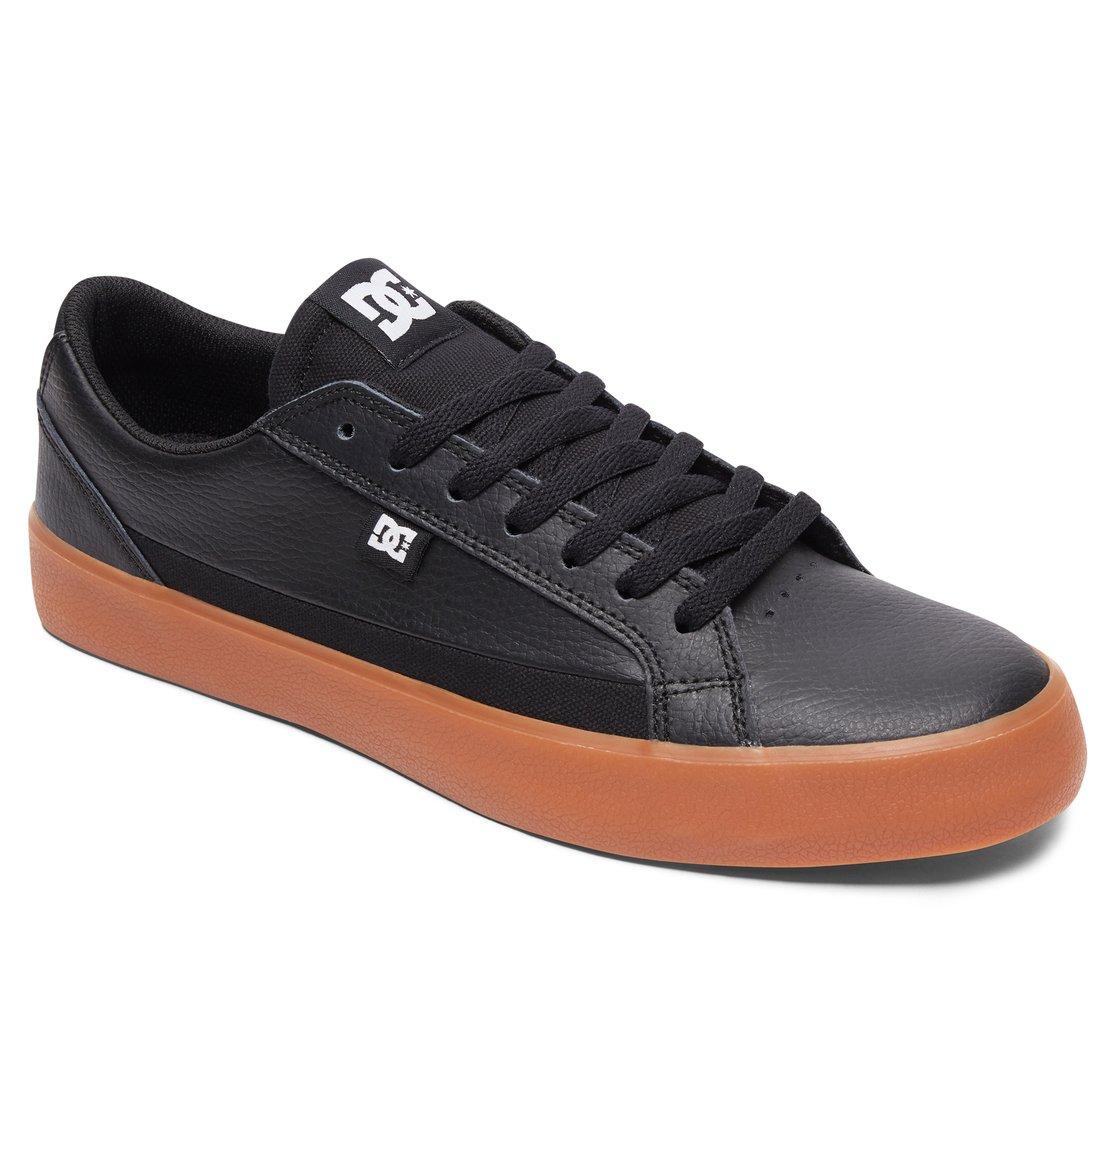 Lynnfield Adys300489 Shoes Dc Schuhe ™ xwOB0qSY1